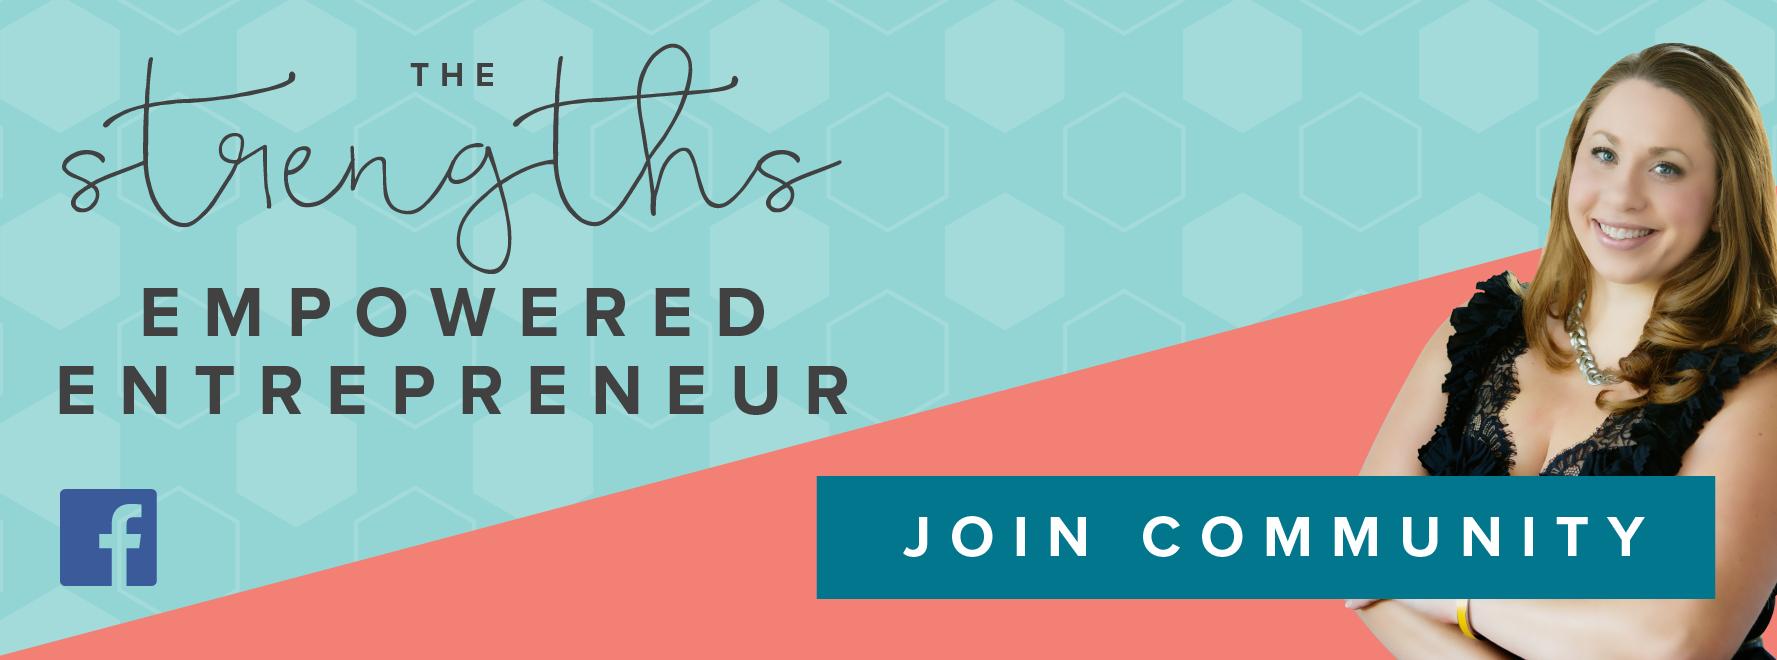 The Strengths Empowered Entrepreneur - https://www.facebook.com/groups/TAEMastermind/